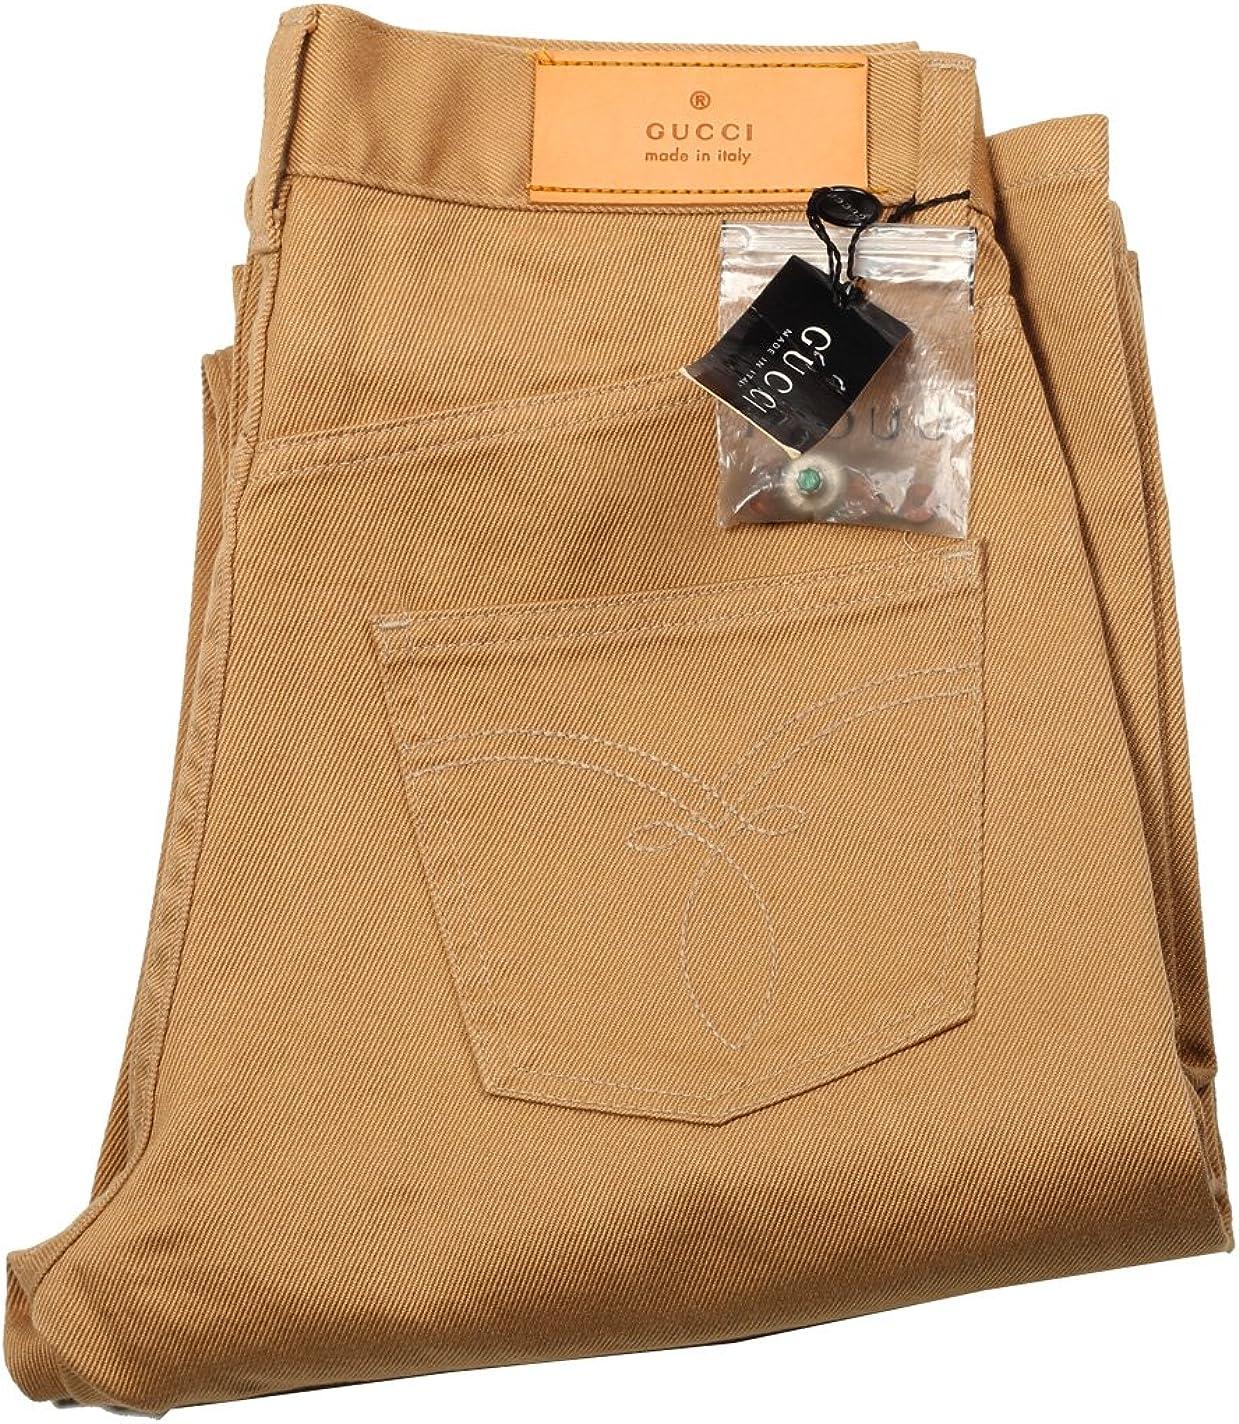 Gucci CL Beige Trousers Size 44/28 U.S. In Cotton